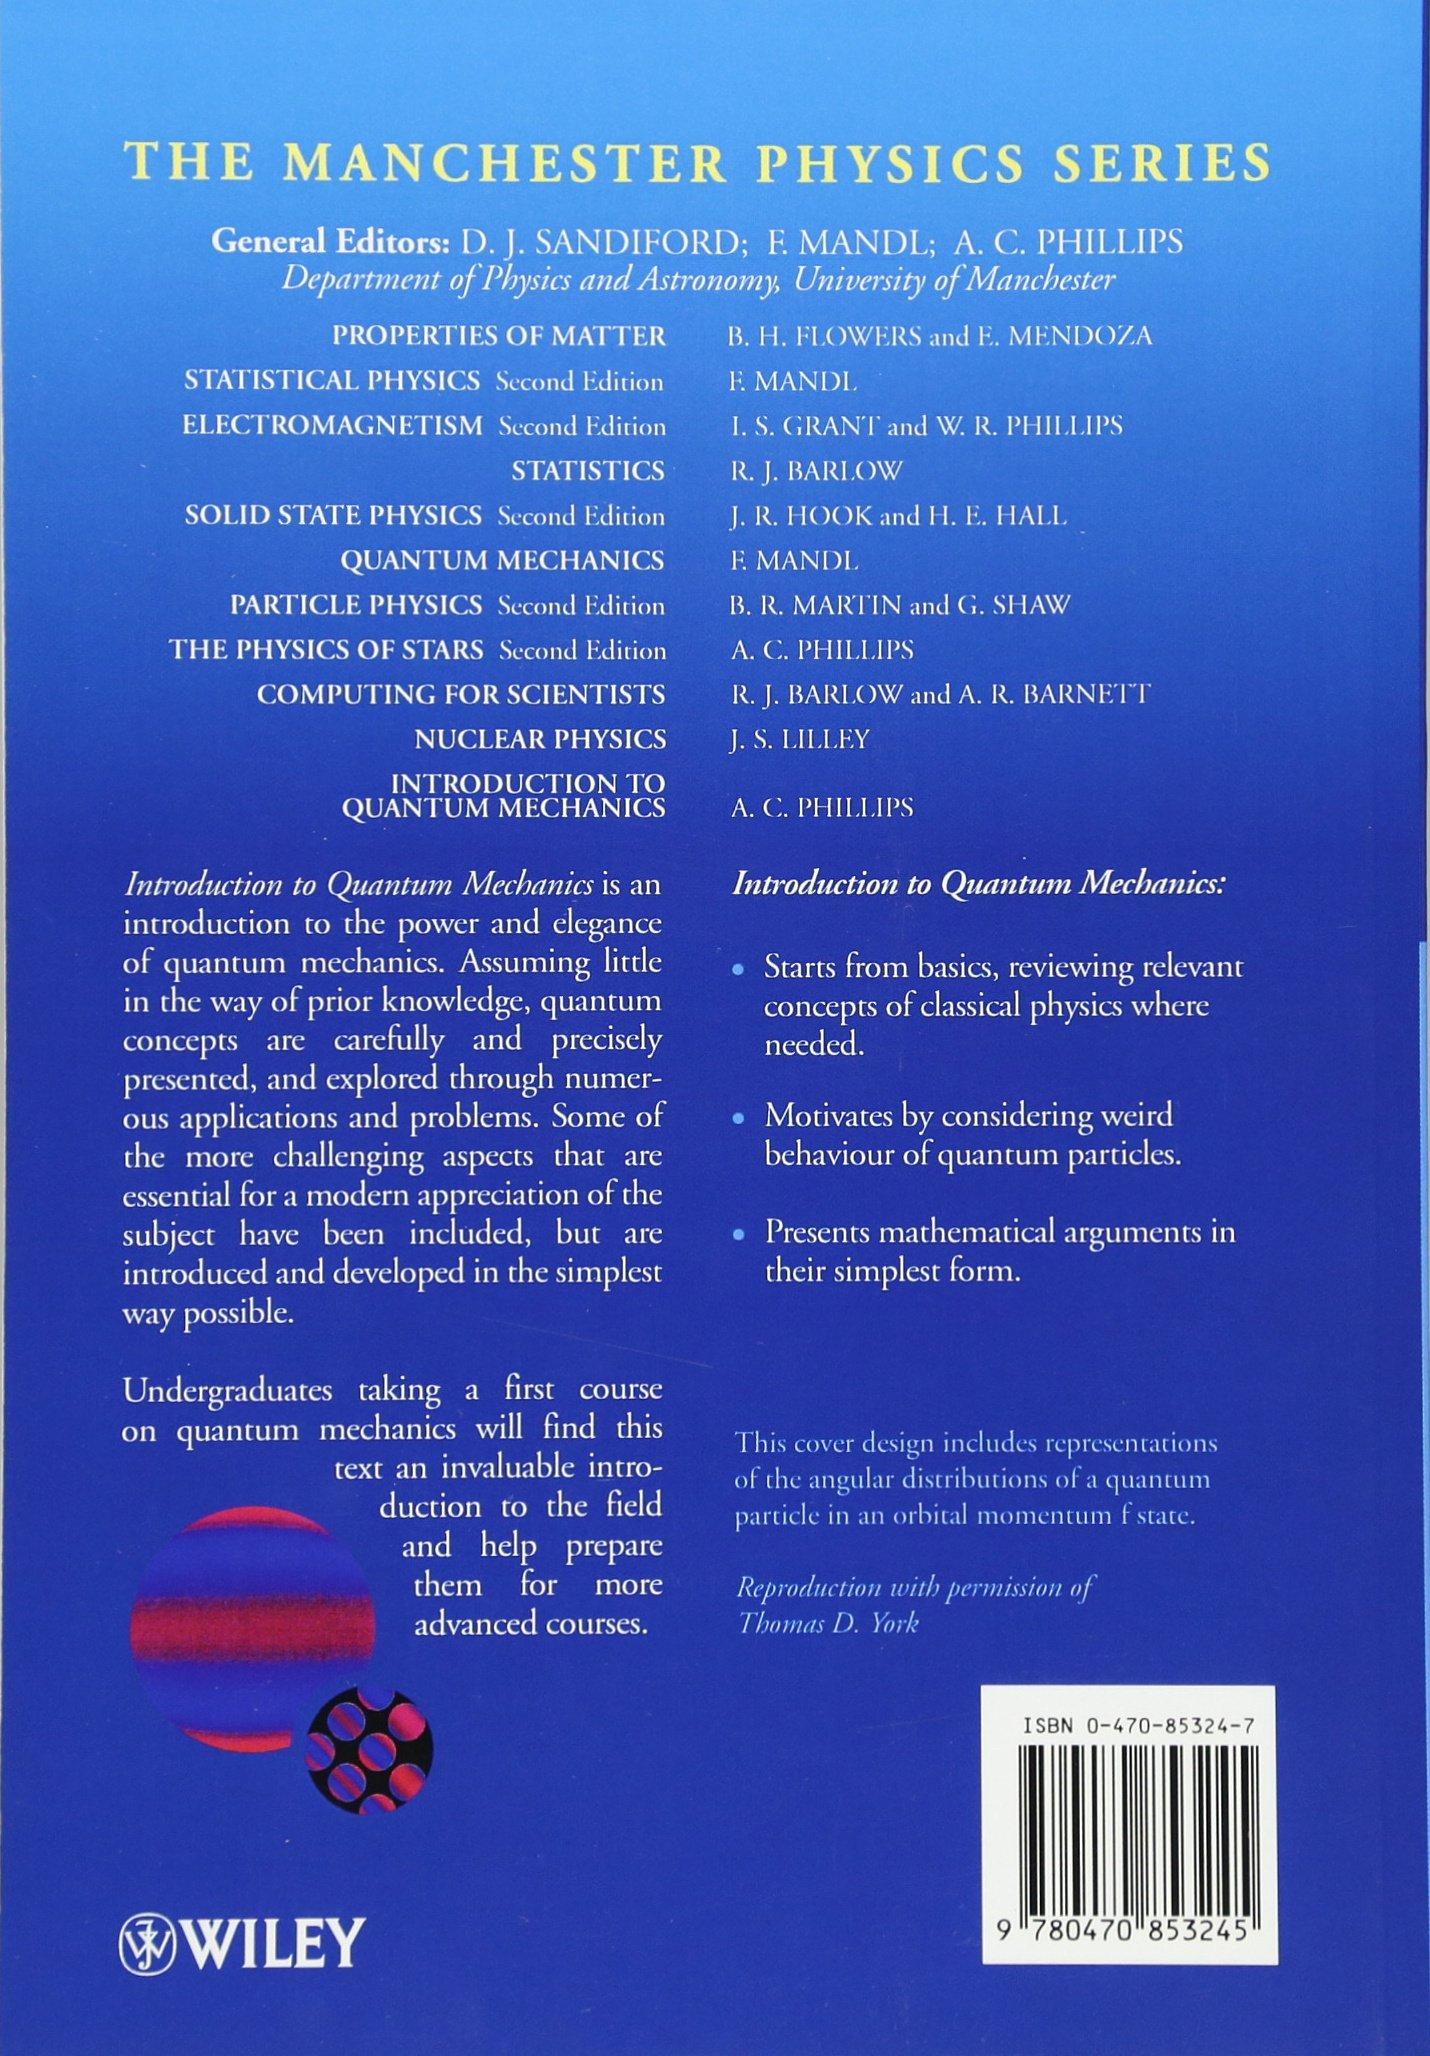 Introduction To Quantum Mechanics 2nd Edition Griffiths Pdf